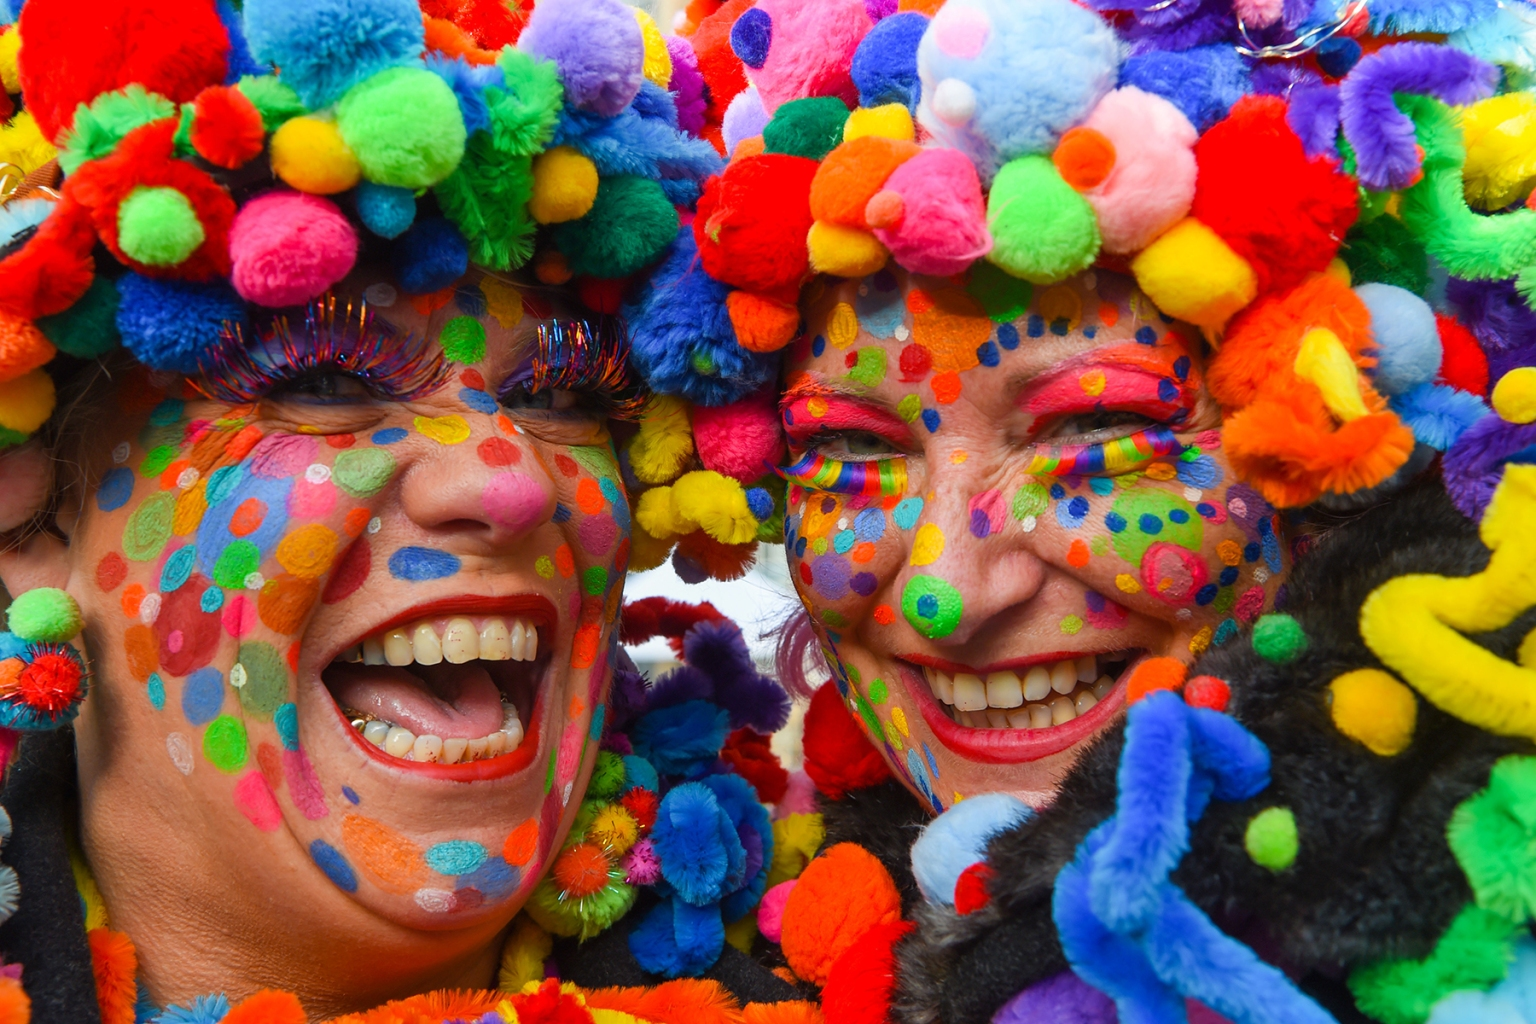 Revelers celebrate the start of the Carnival season in Duesseldorf, western Germany, on Nov. 11. PATRIK STOLLARZ/AFP/Getty Images